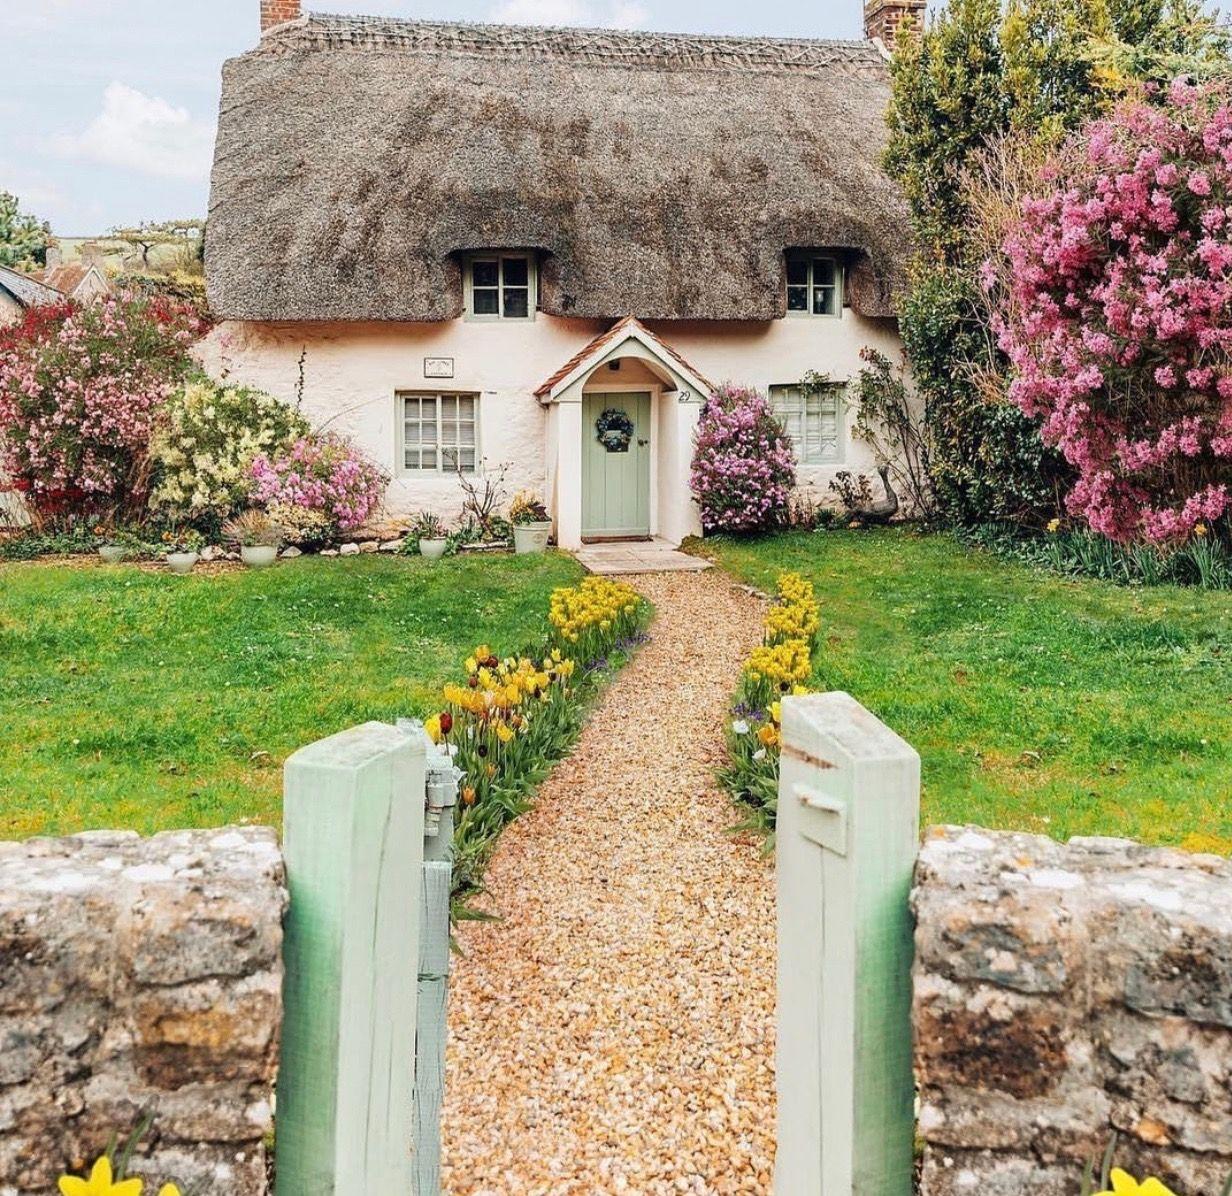 Cute Cottage, Cottage Garden, English Cottage